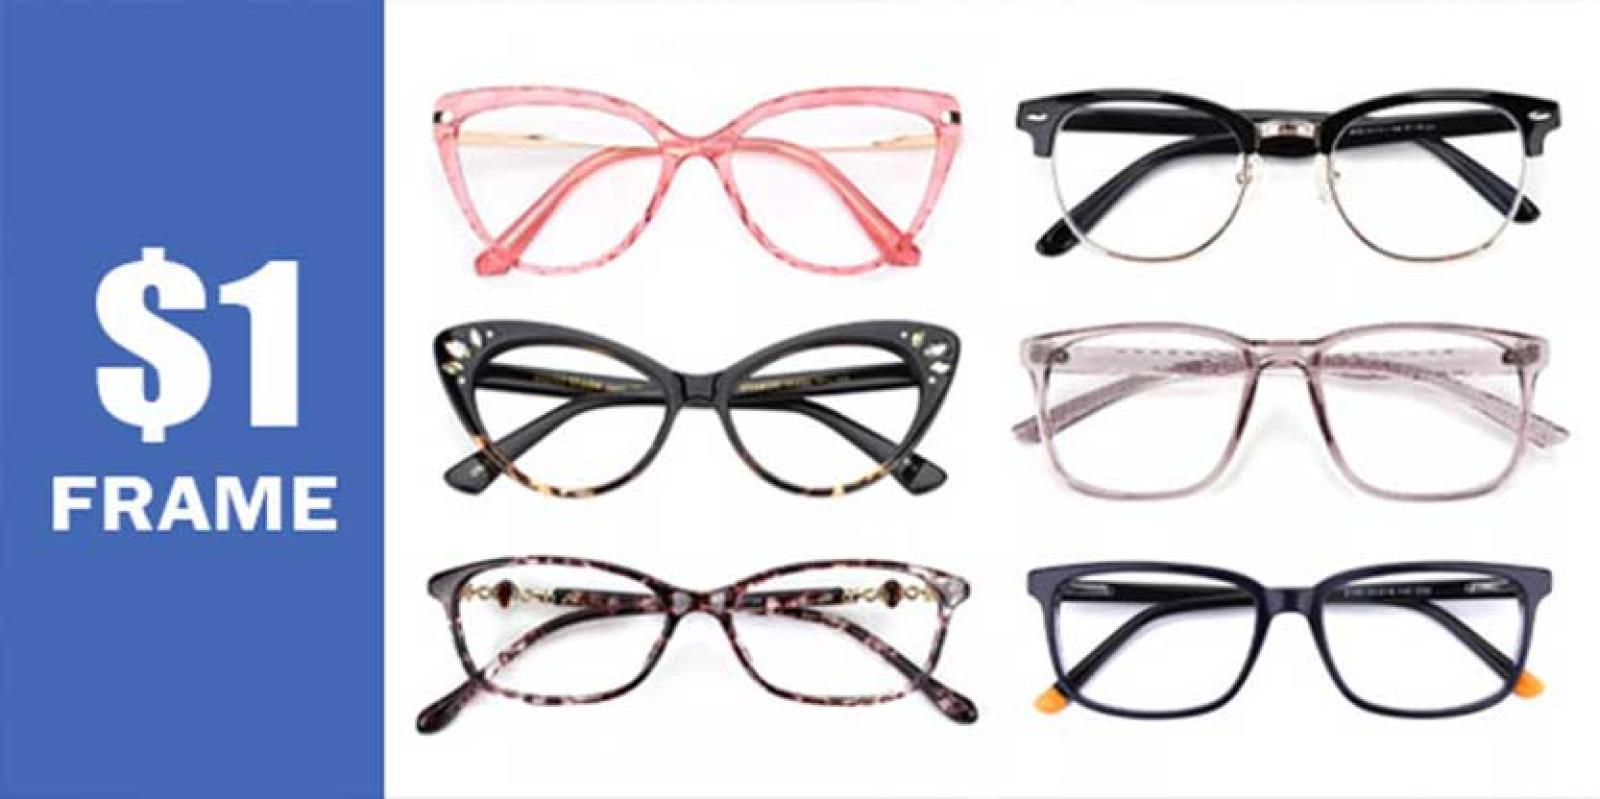 1.61 High-Index Flat Top Bifocal With Line-Translucent---Eyeglasses-additional3